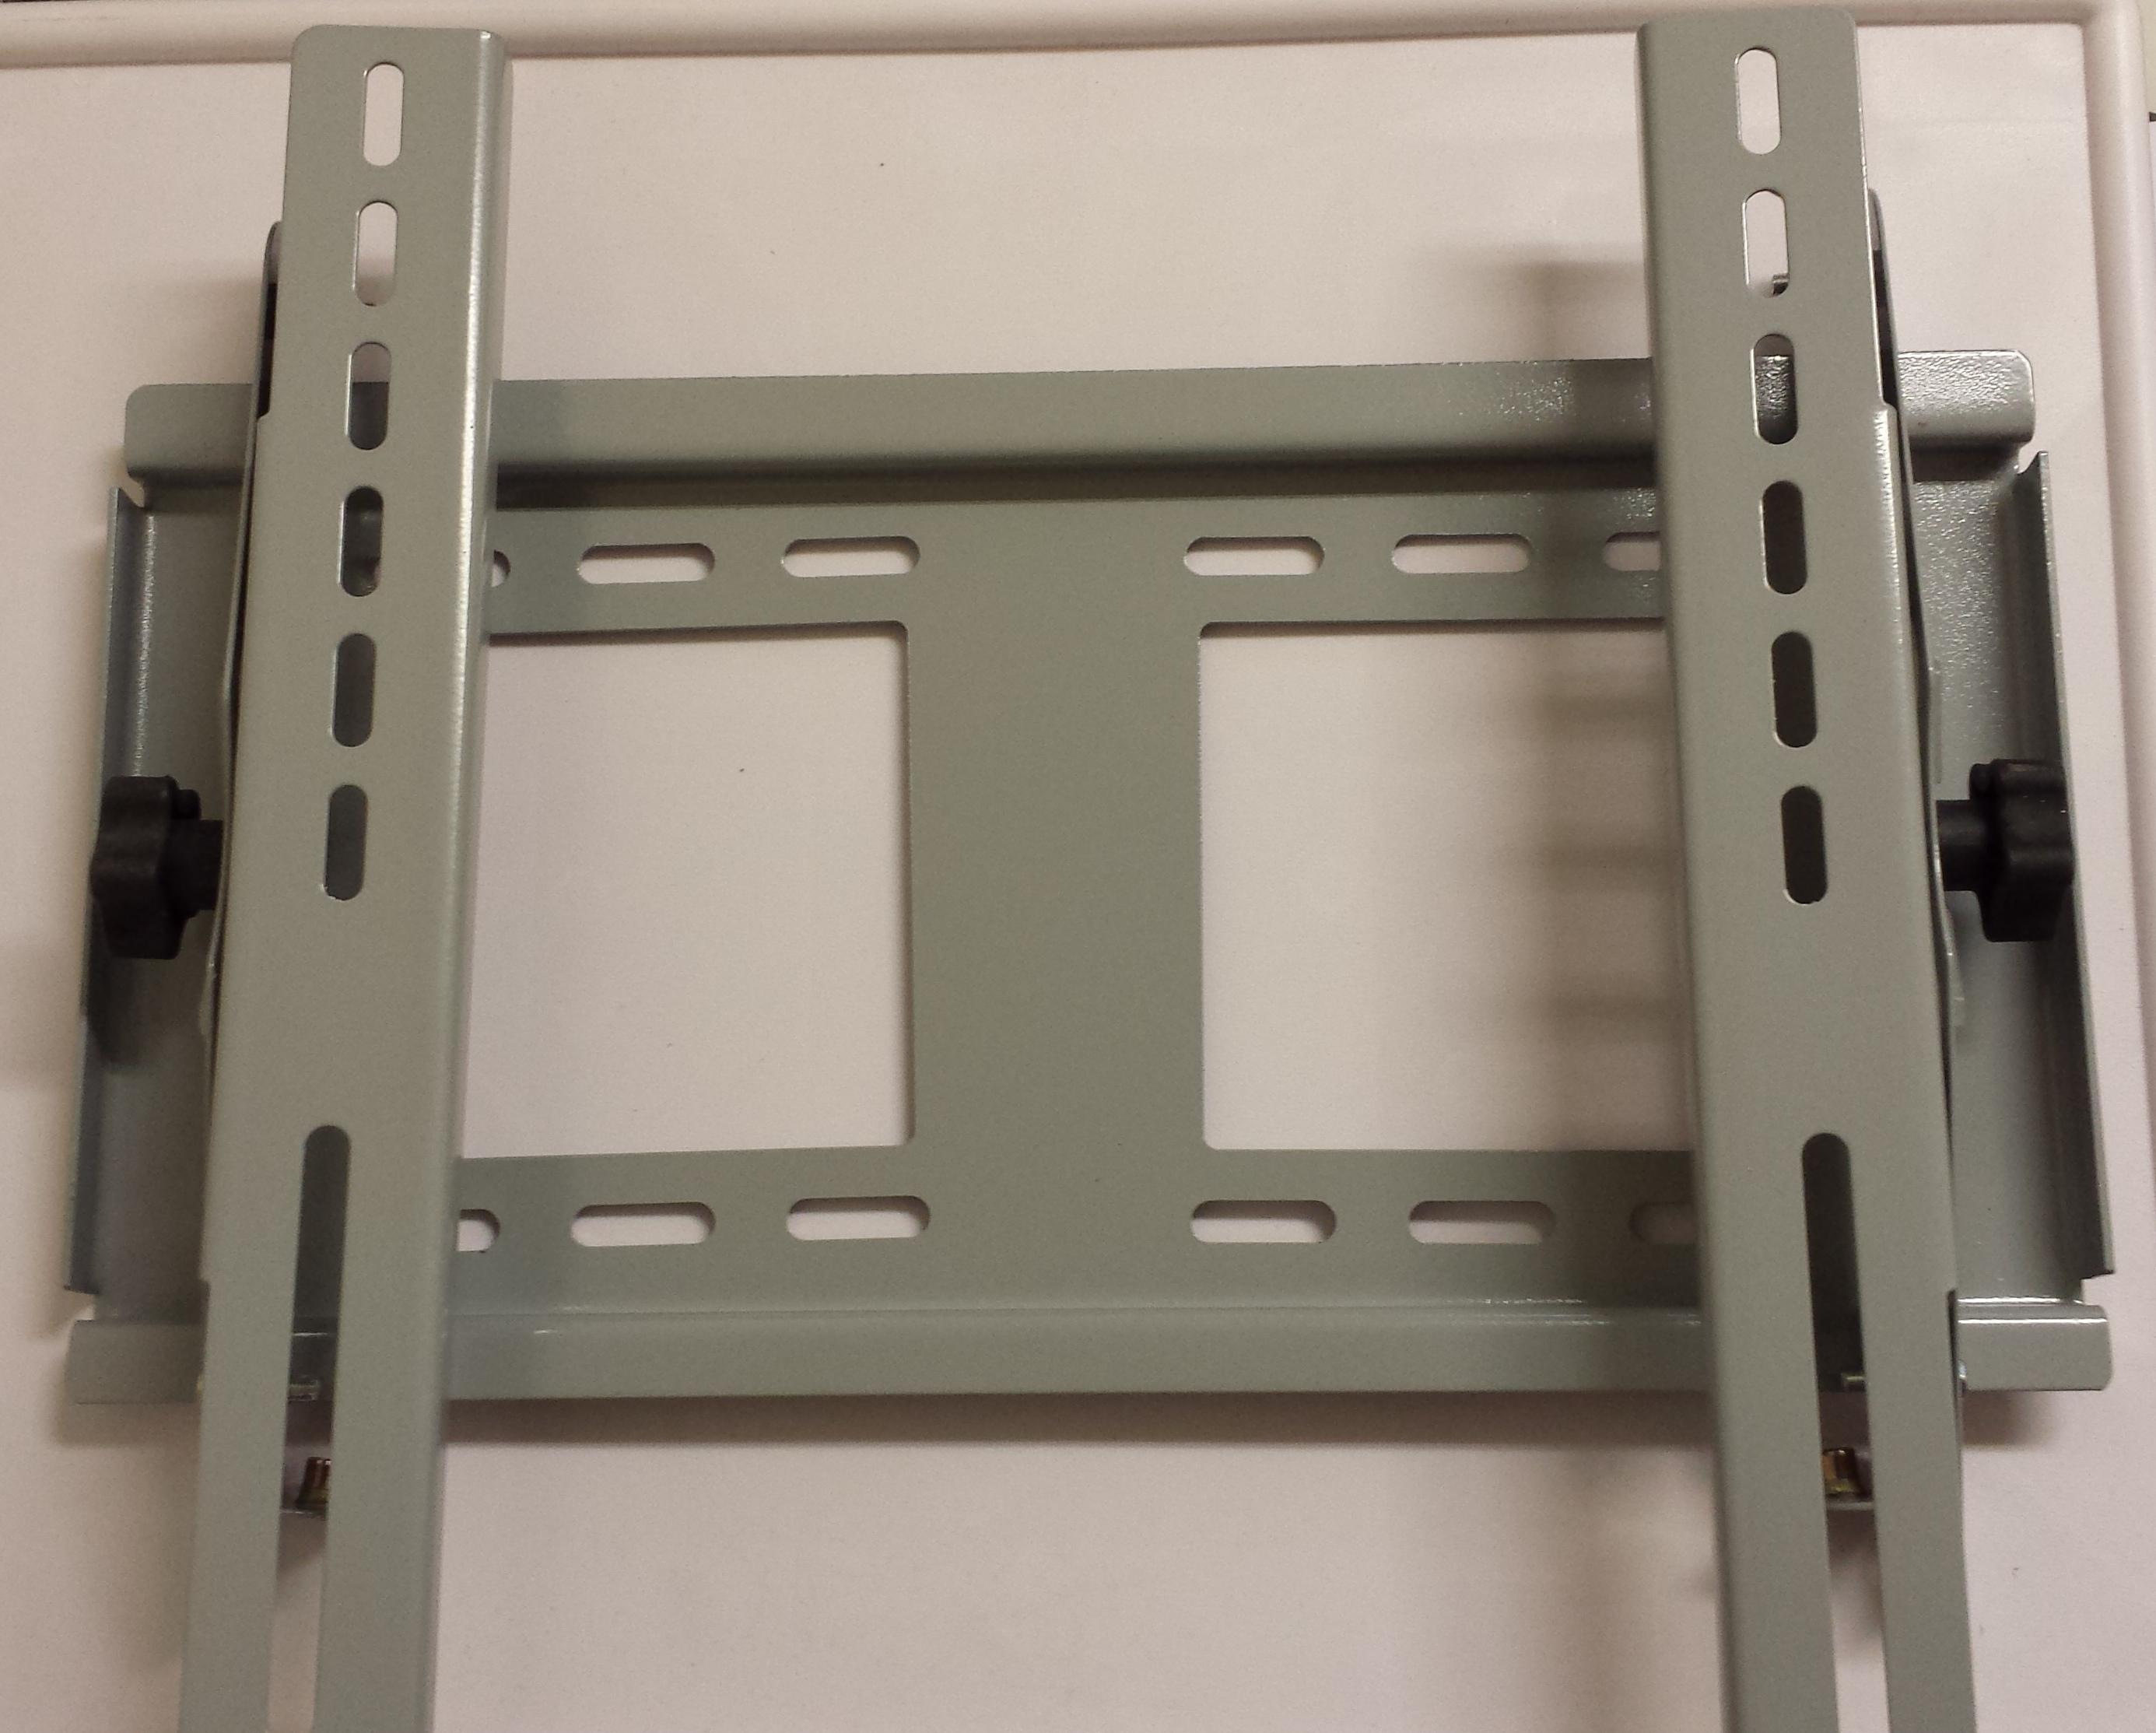 Universal TV Mount bracket Tlit for LCD LED Plasma 22 - 37 SONY LG SAMSUNG JVC